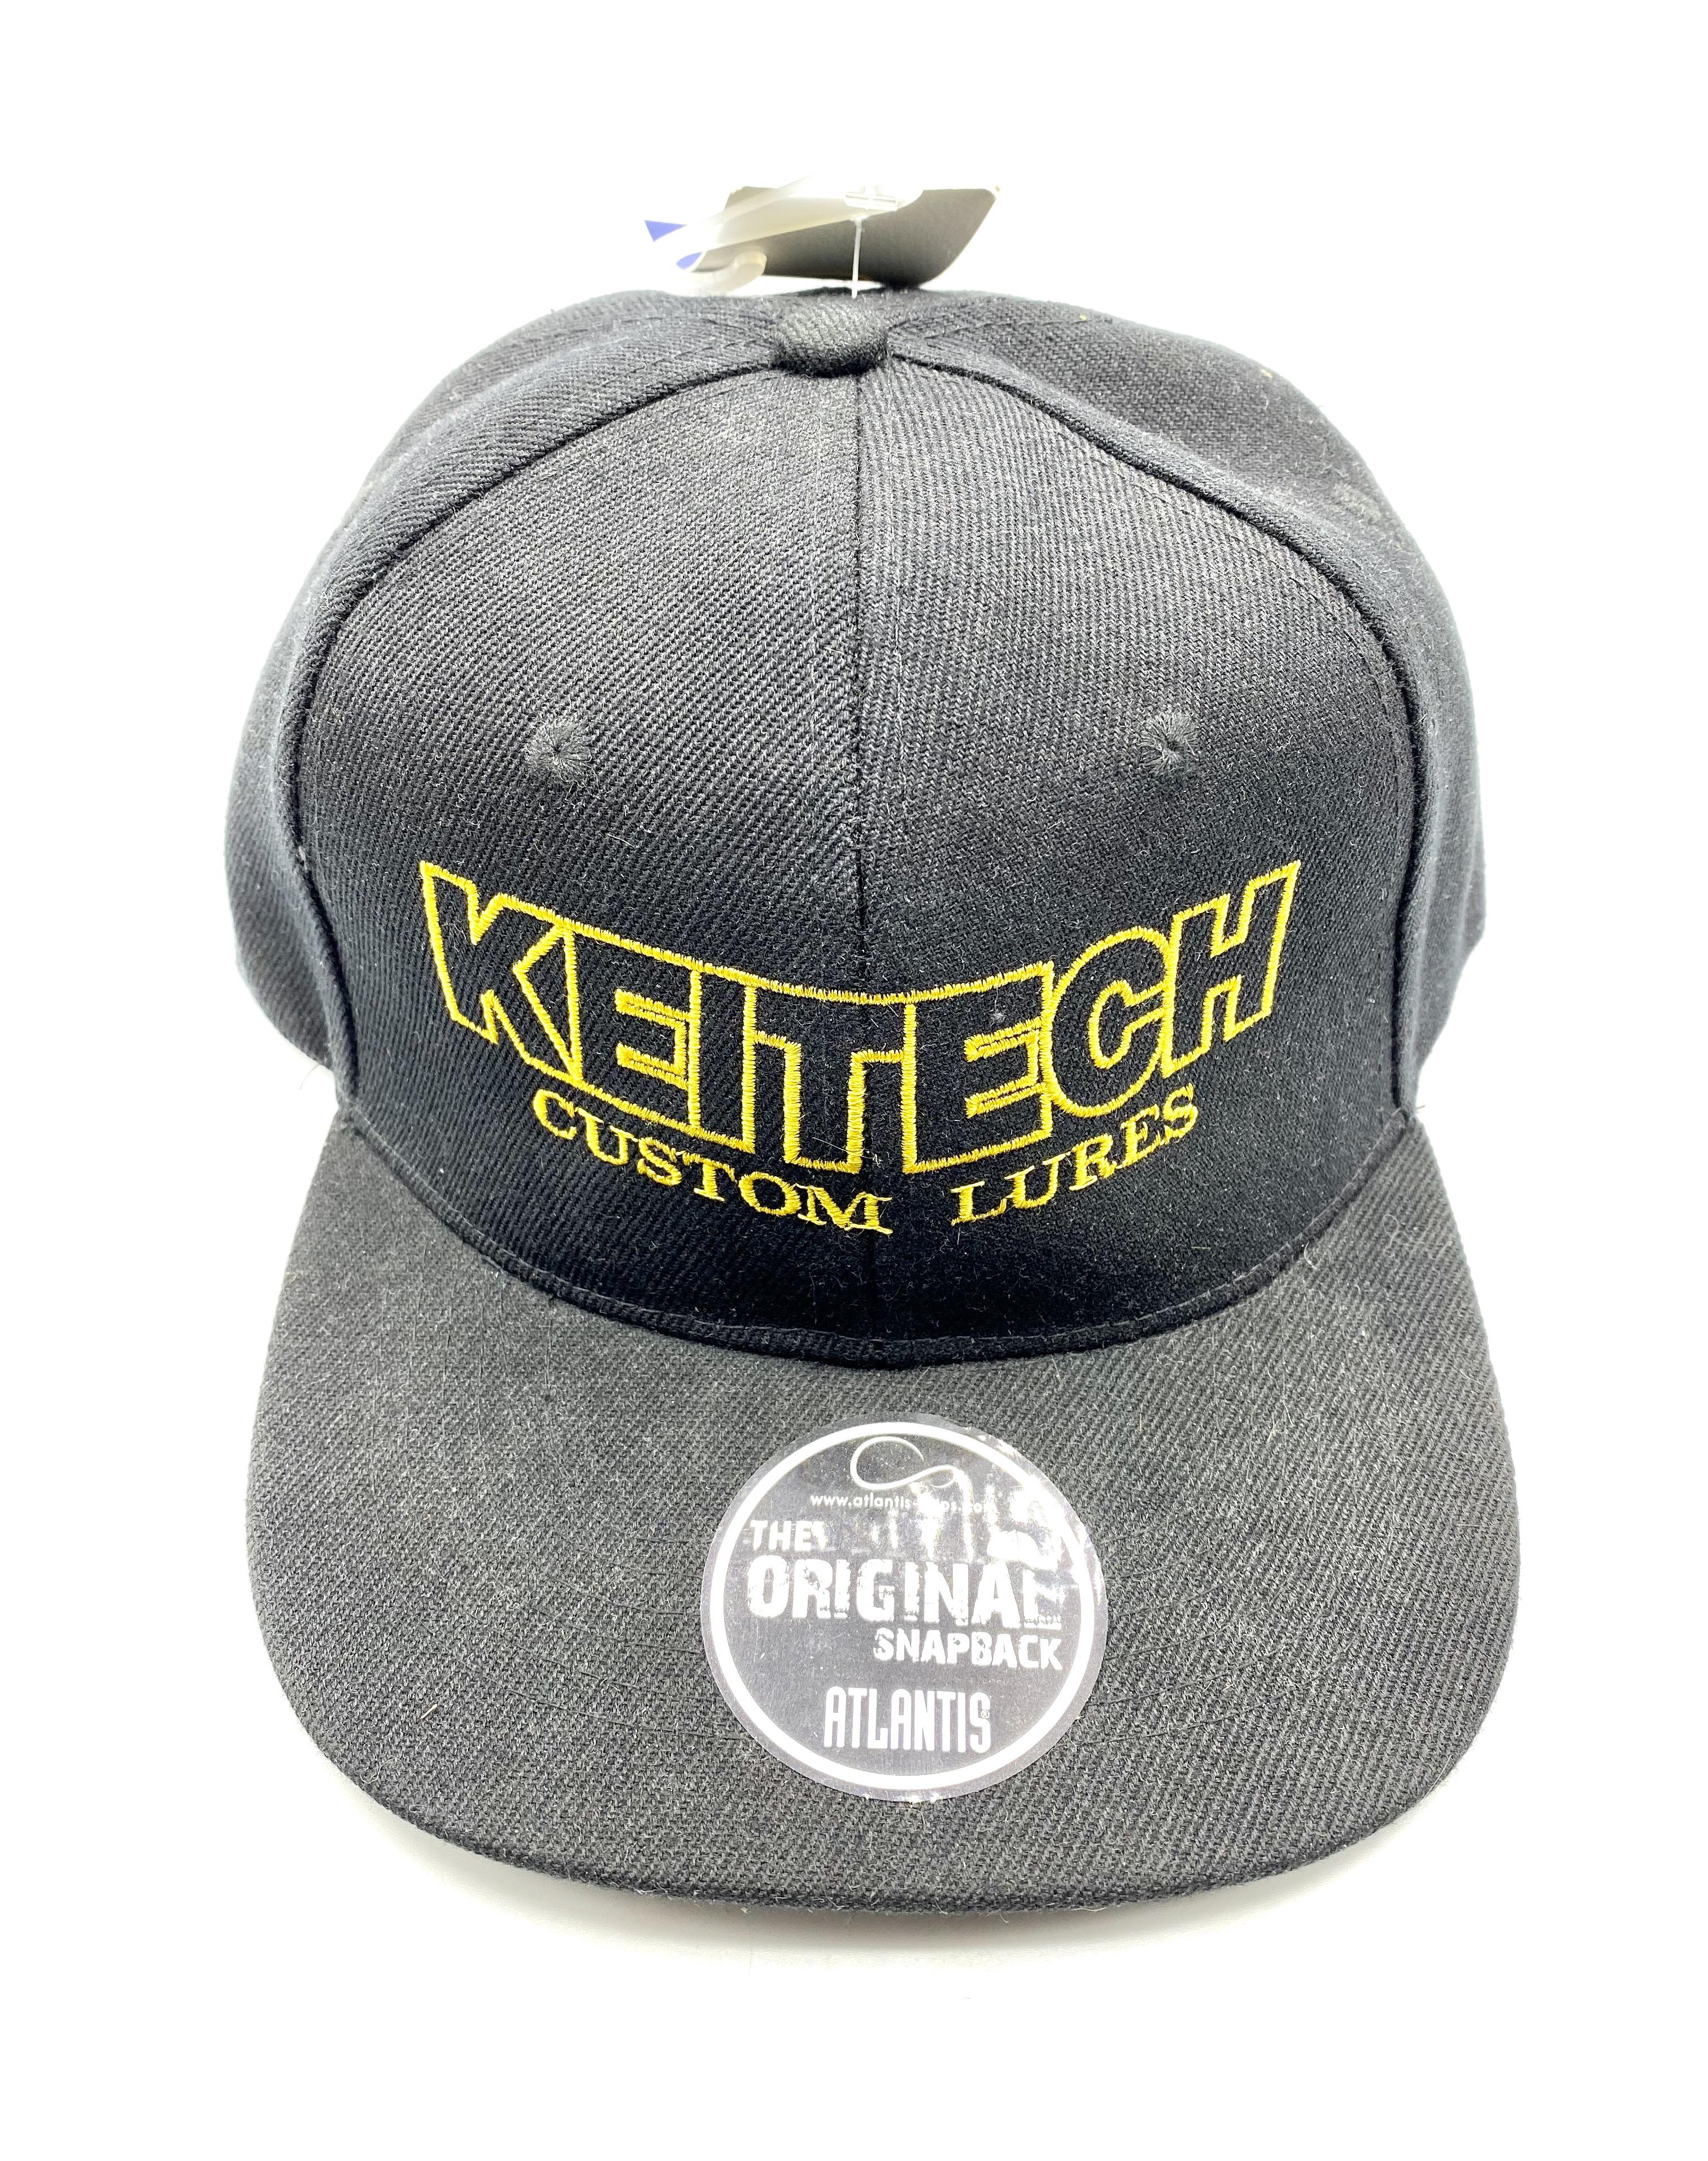 Keitech - Original cap